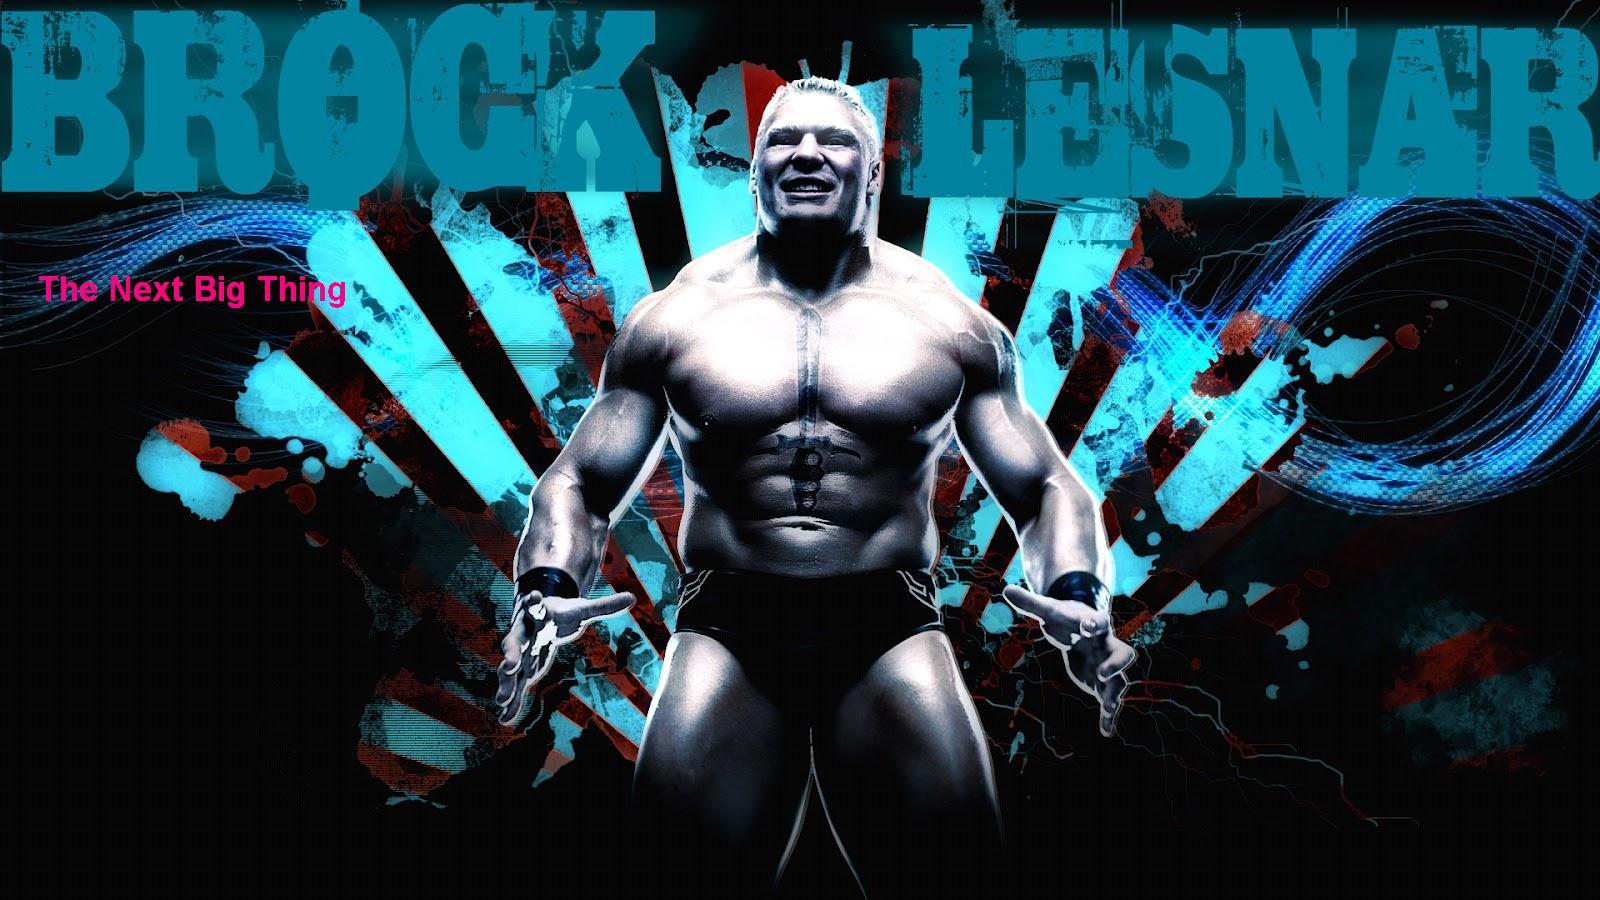 WWE Brock Lesnar Hd Wallpapers 2012 Updated   Download Games 1600x900